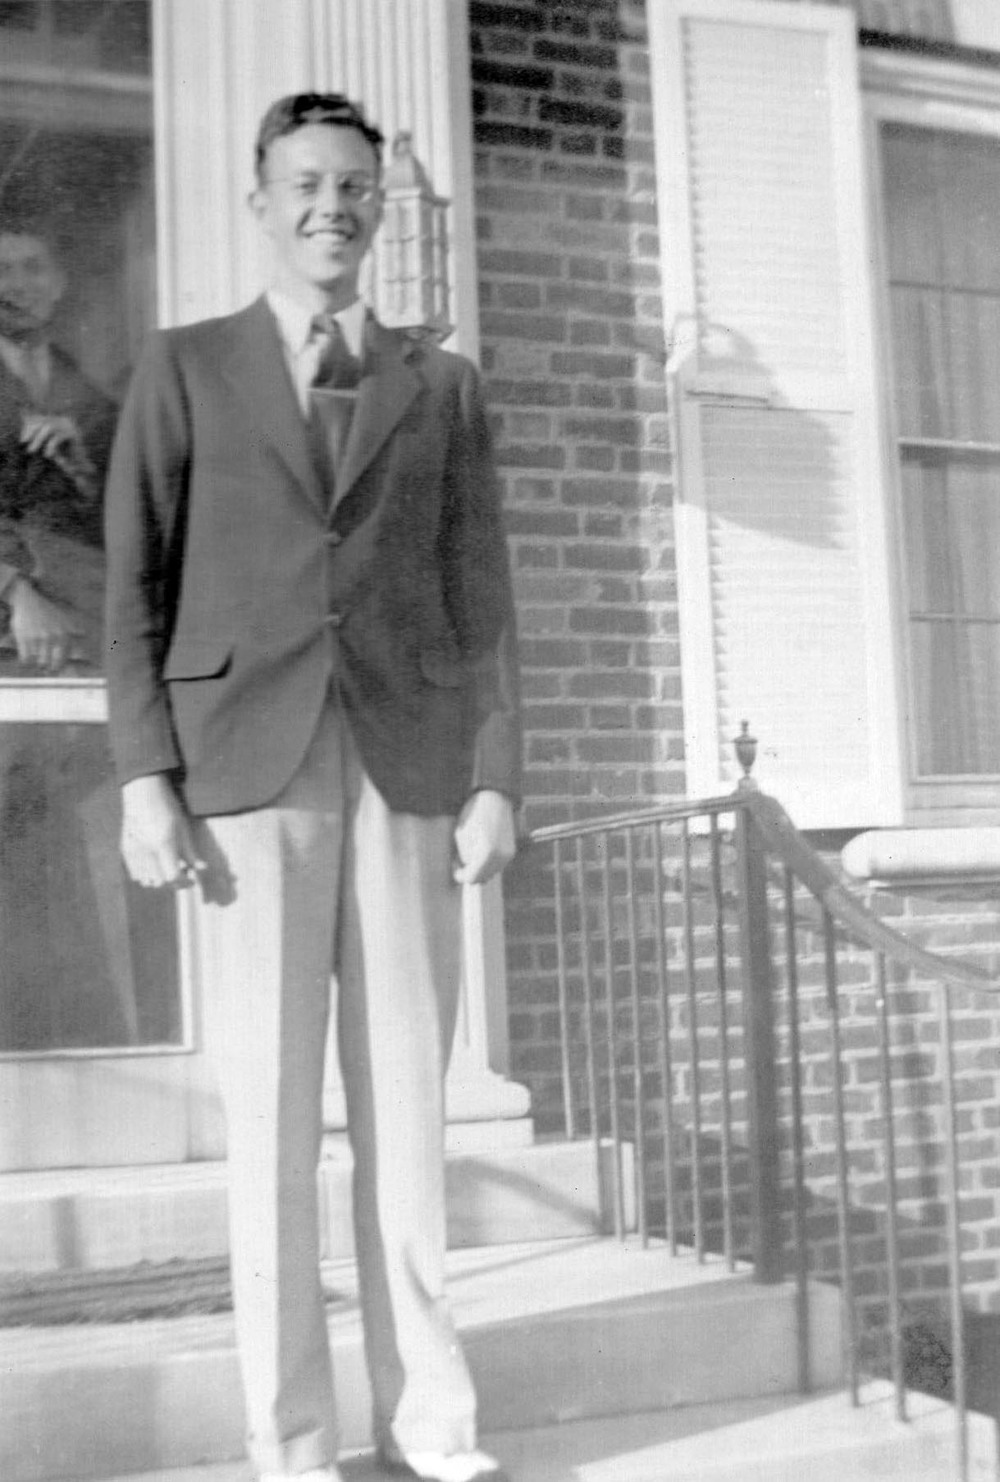 Benjamin L. Small Jr. 1934